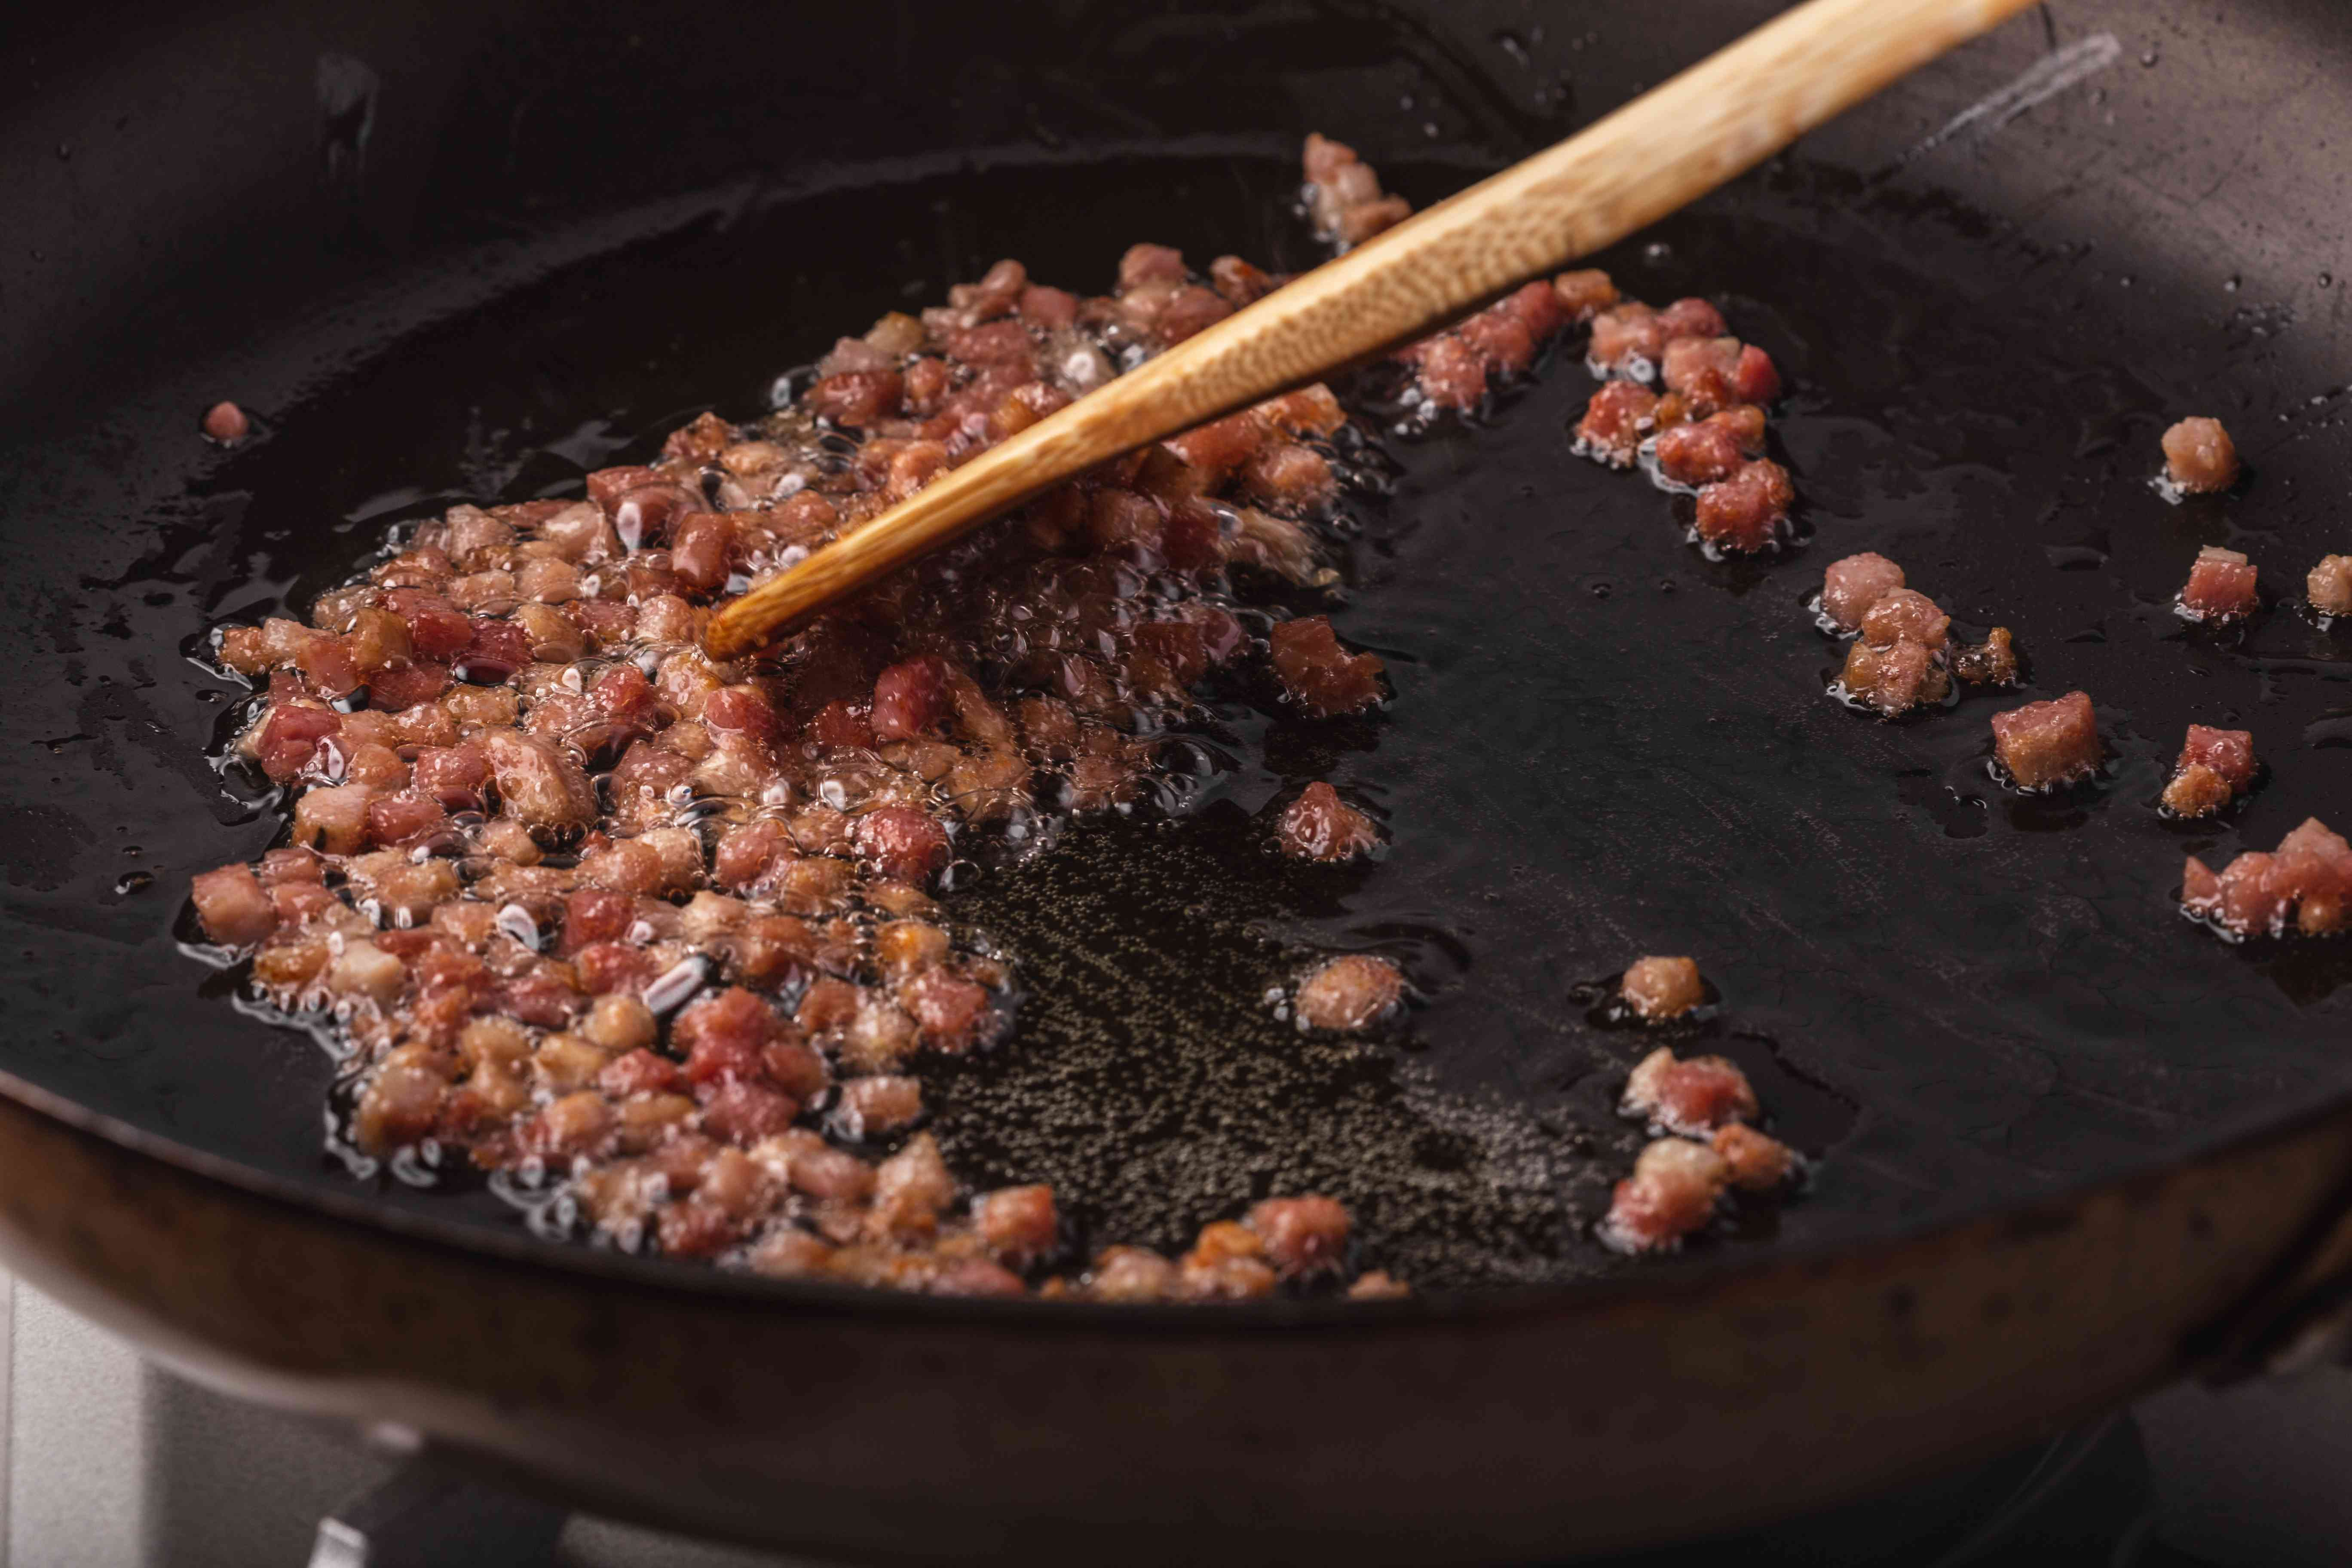 Sauteeing pancetta to make an easy chicken marsala recipe.